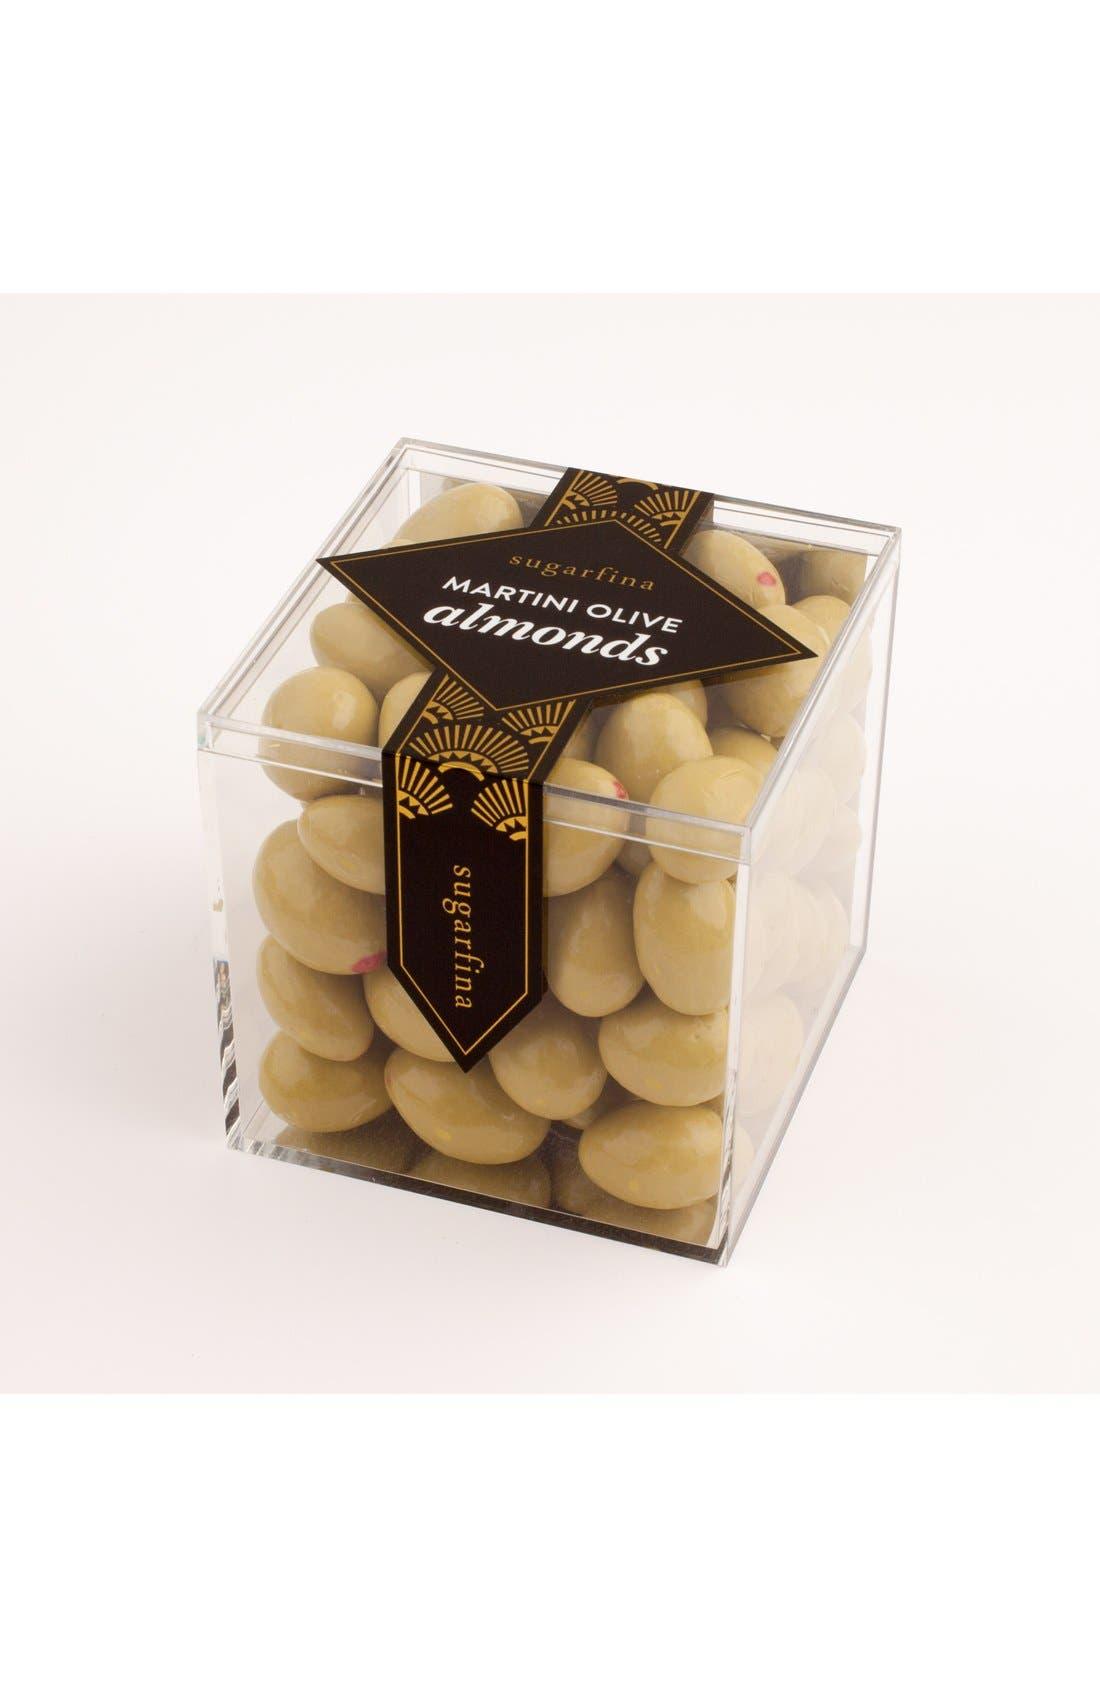 Main Image - sugarfina 'Martini Olive' Chocolate Covered Almonds